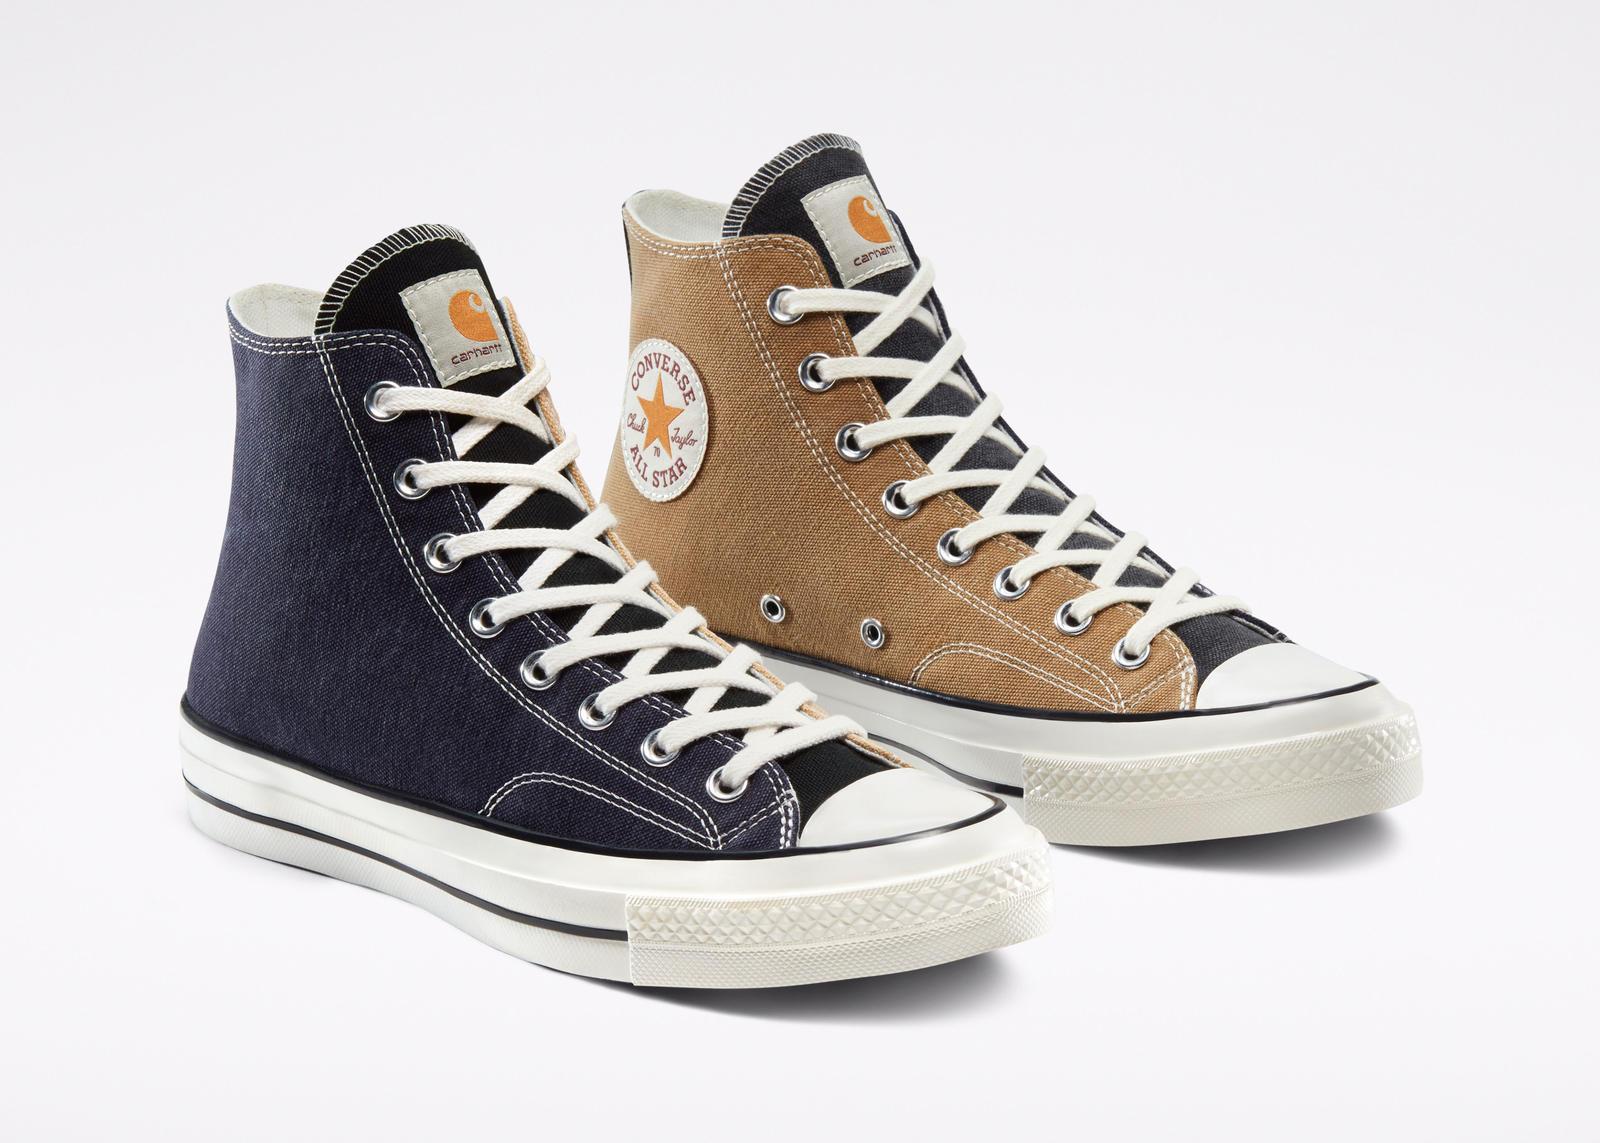 Converse x Carhartt WIP Renew Chuck 70 - 搭配正装也合适的8款球鞋